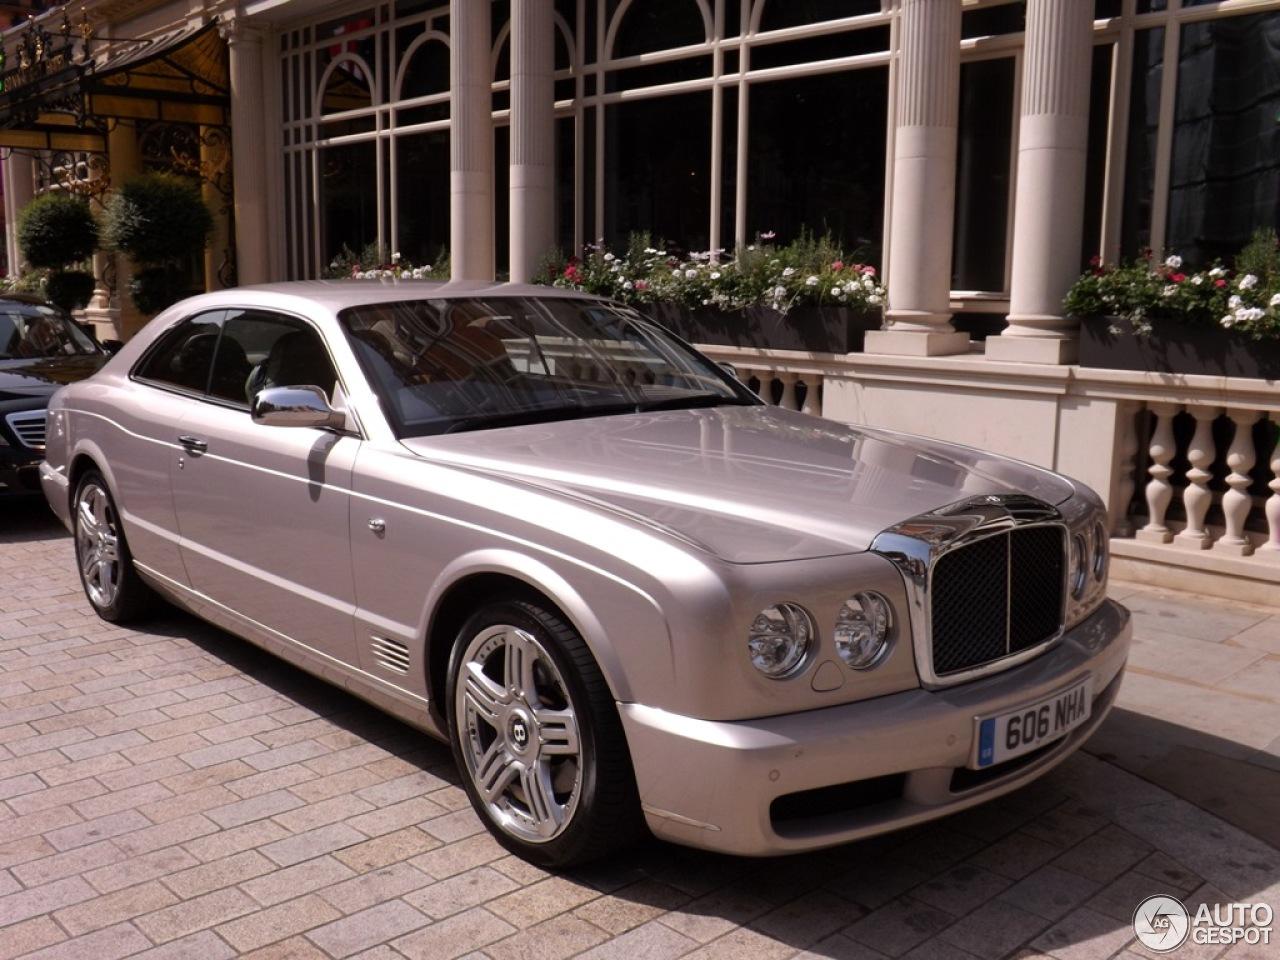 Bentley brooklands 2008 10 january 2014 autogespot 6 i bentley brooklands 2008 6 vanachro Choice Image